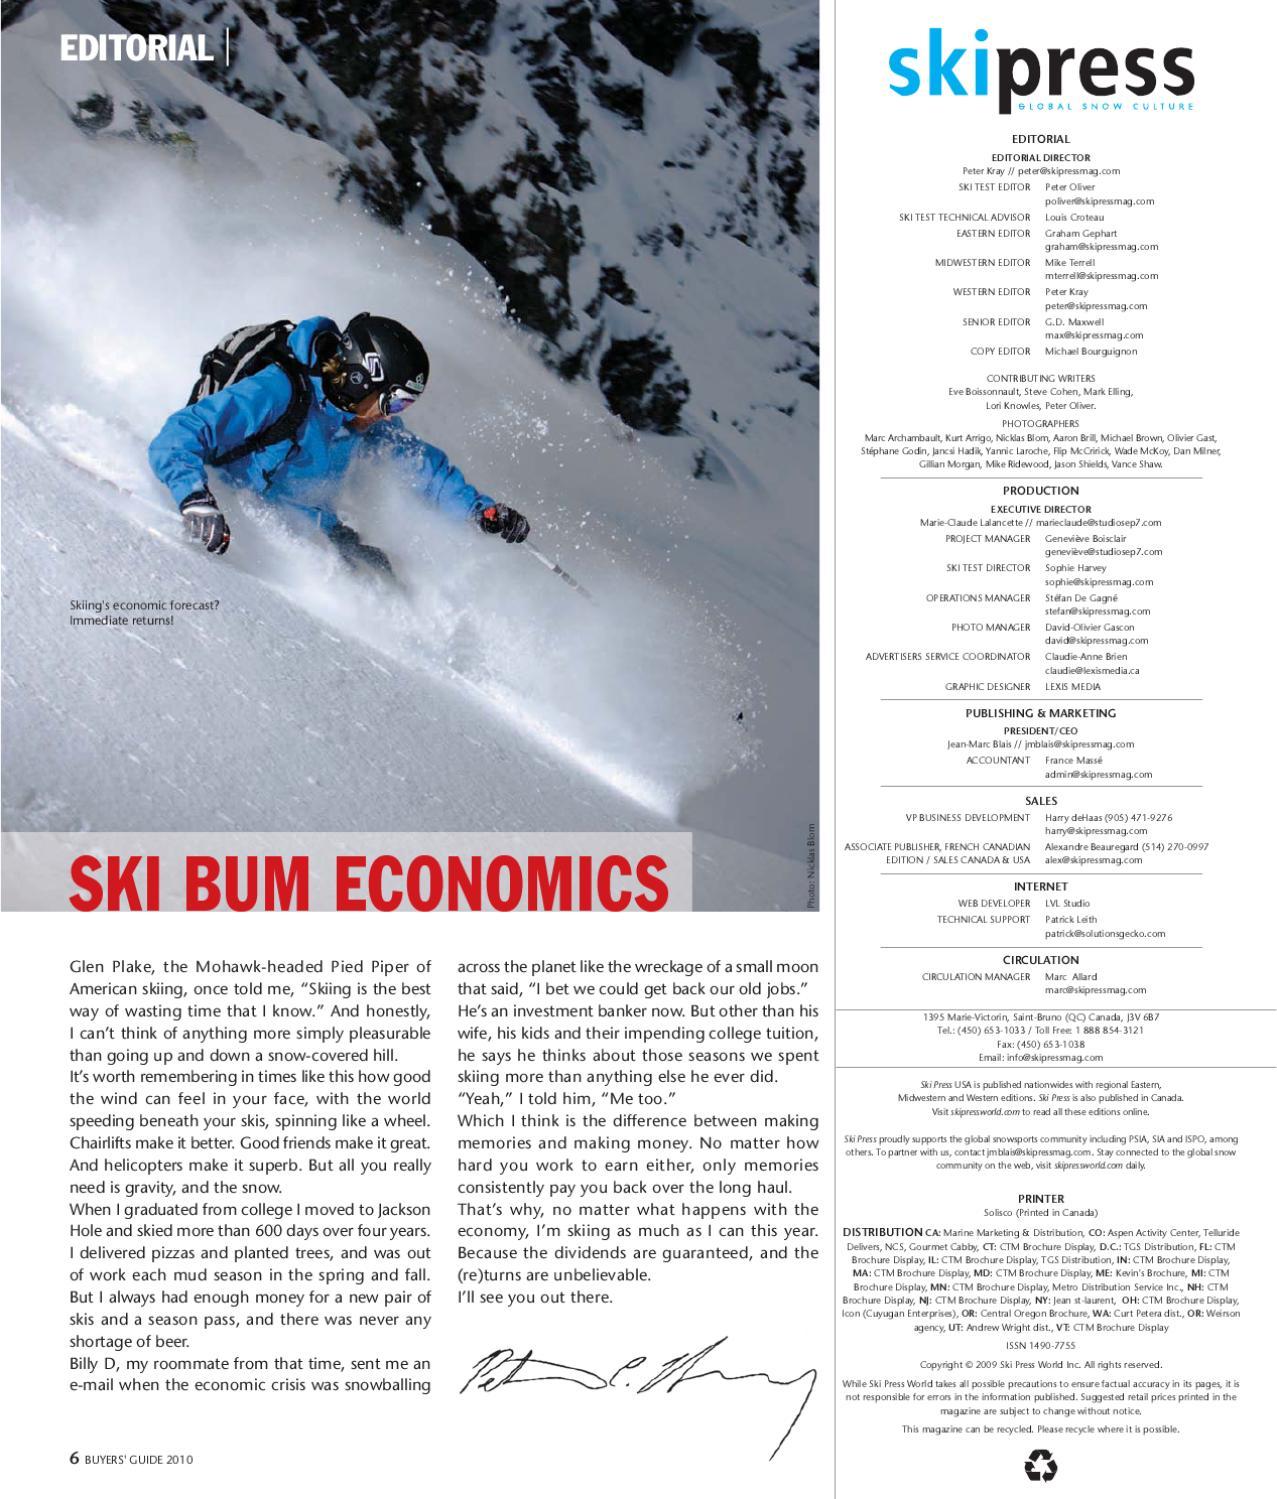 ski press usa vol 9 1 by skipressnews issuu rh issuu com Buyers Guide.pdf Central Wisconsin Buyer's Guide